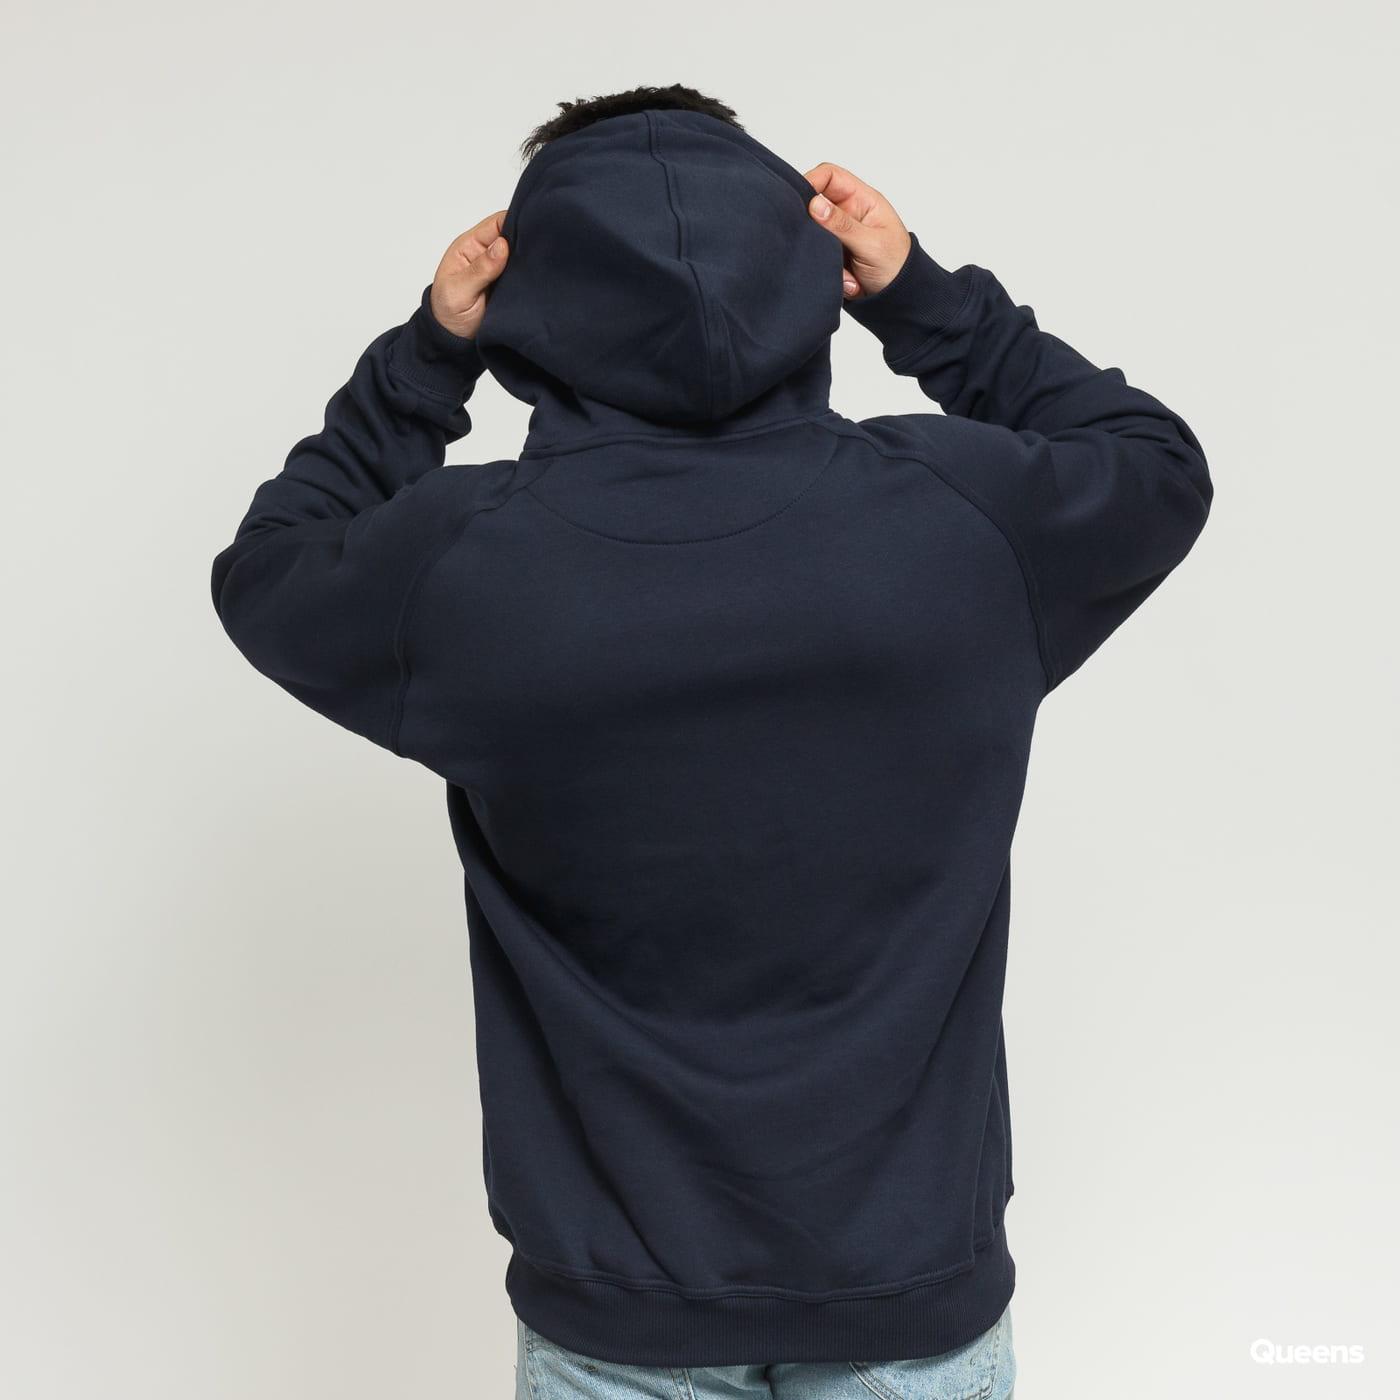 Urban Classics Blank Hoody navy